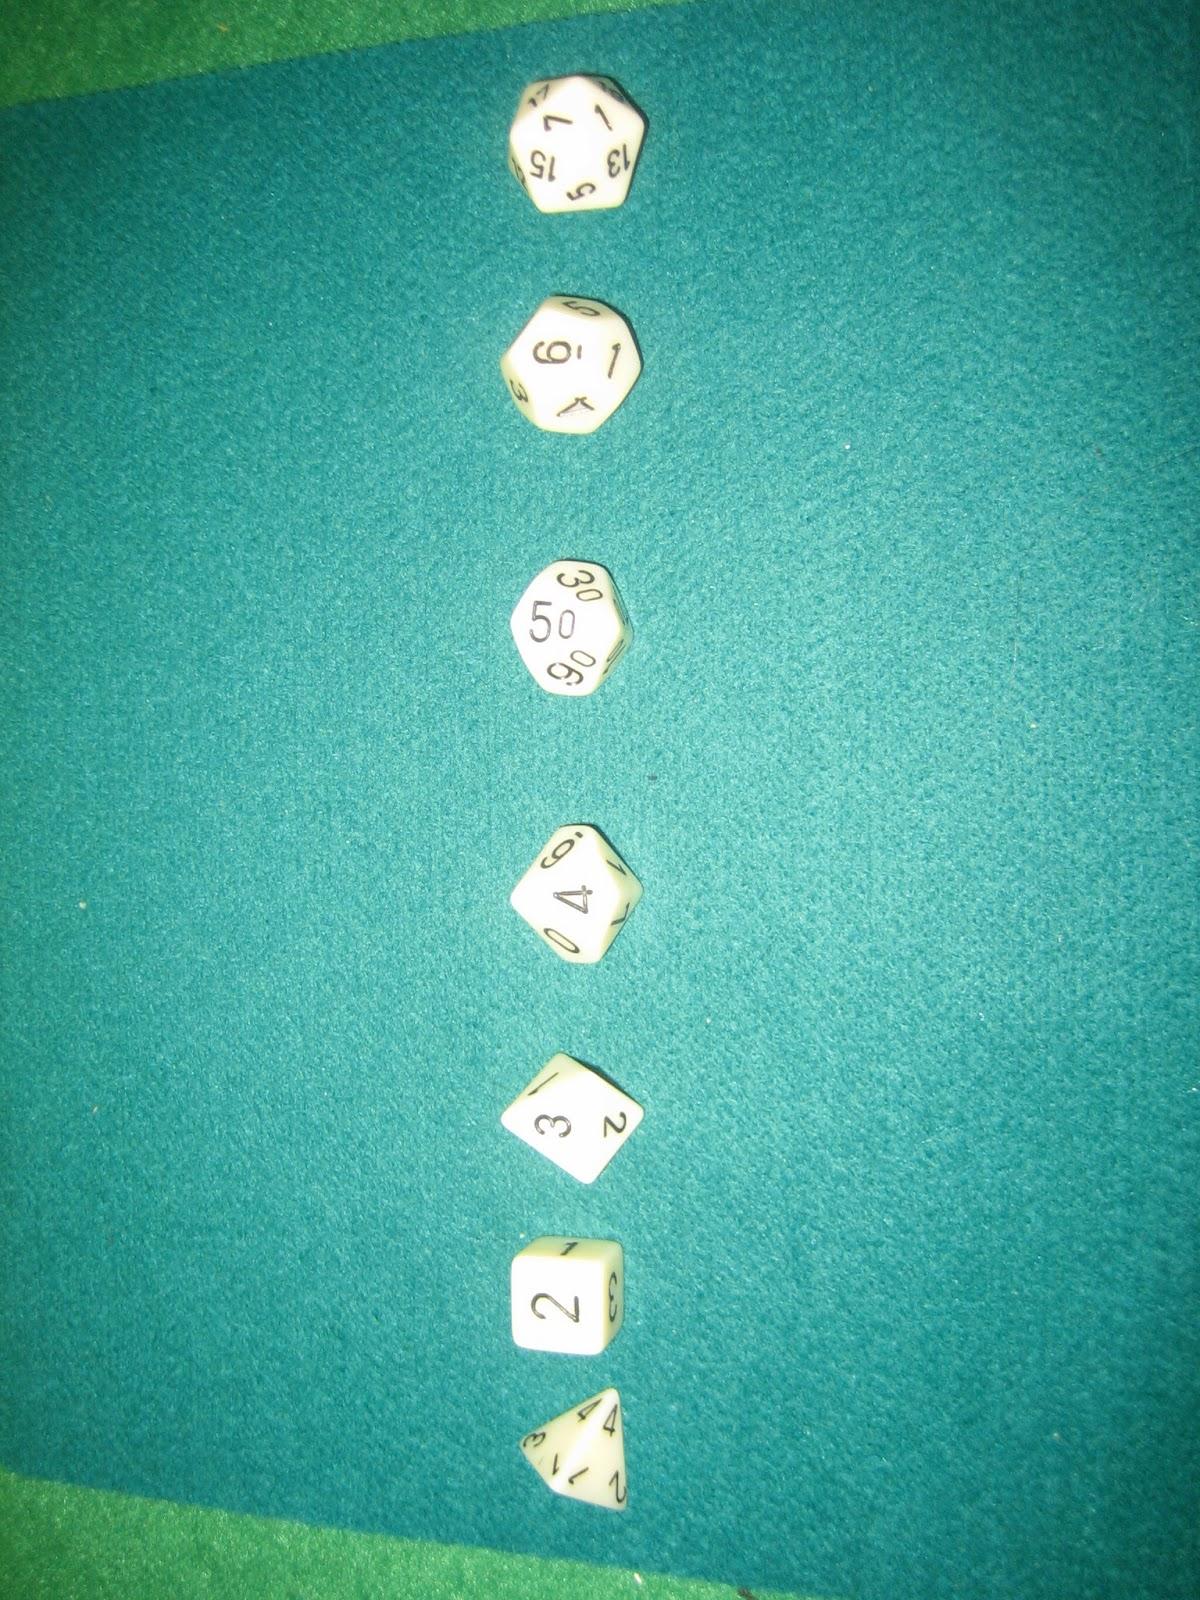 Spin palace casino signup bonus